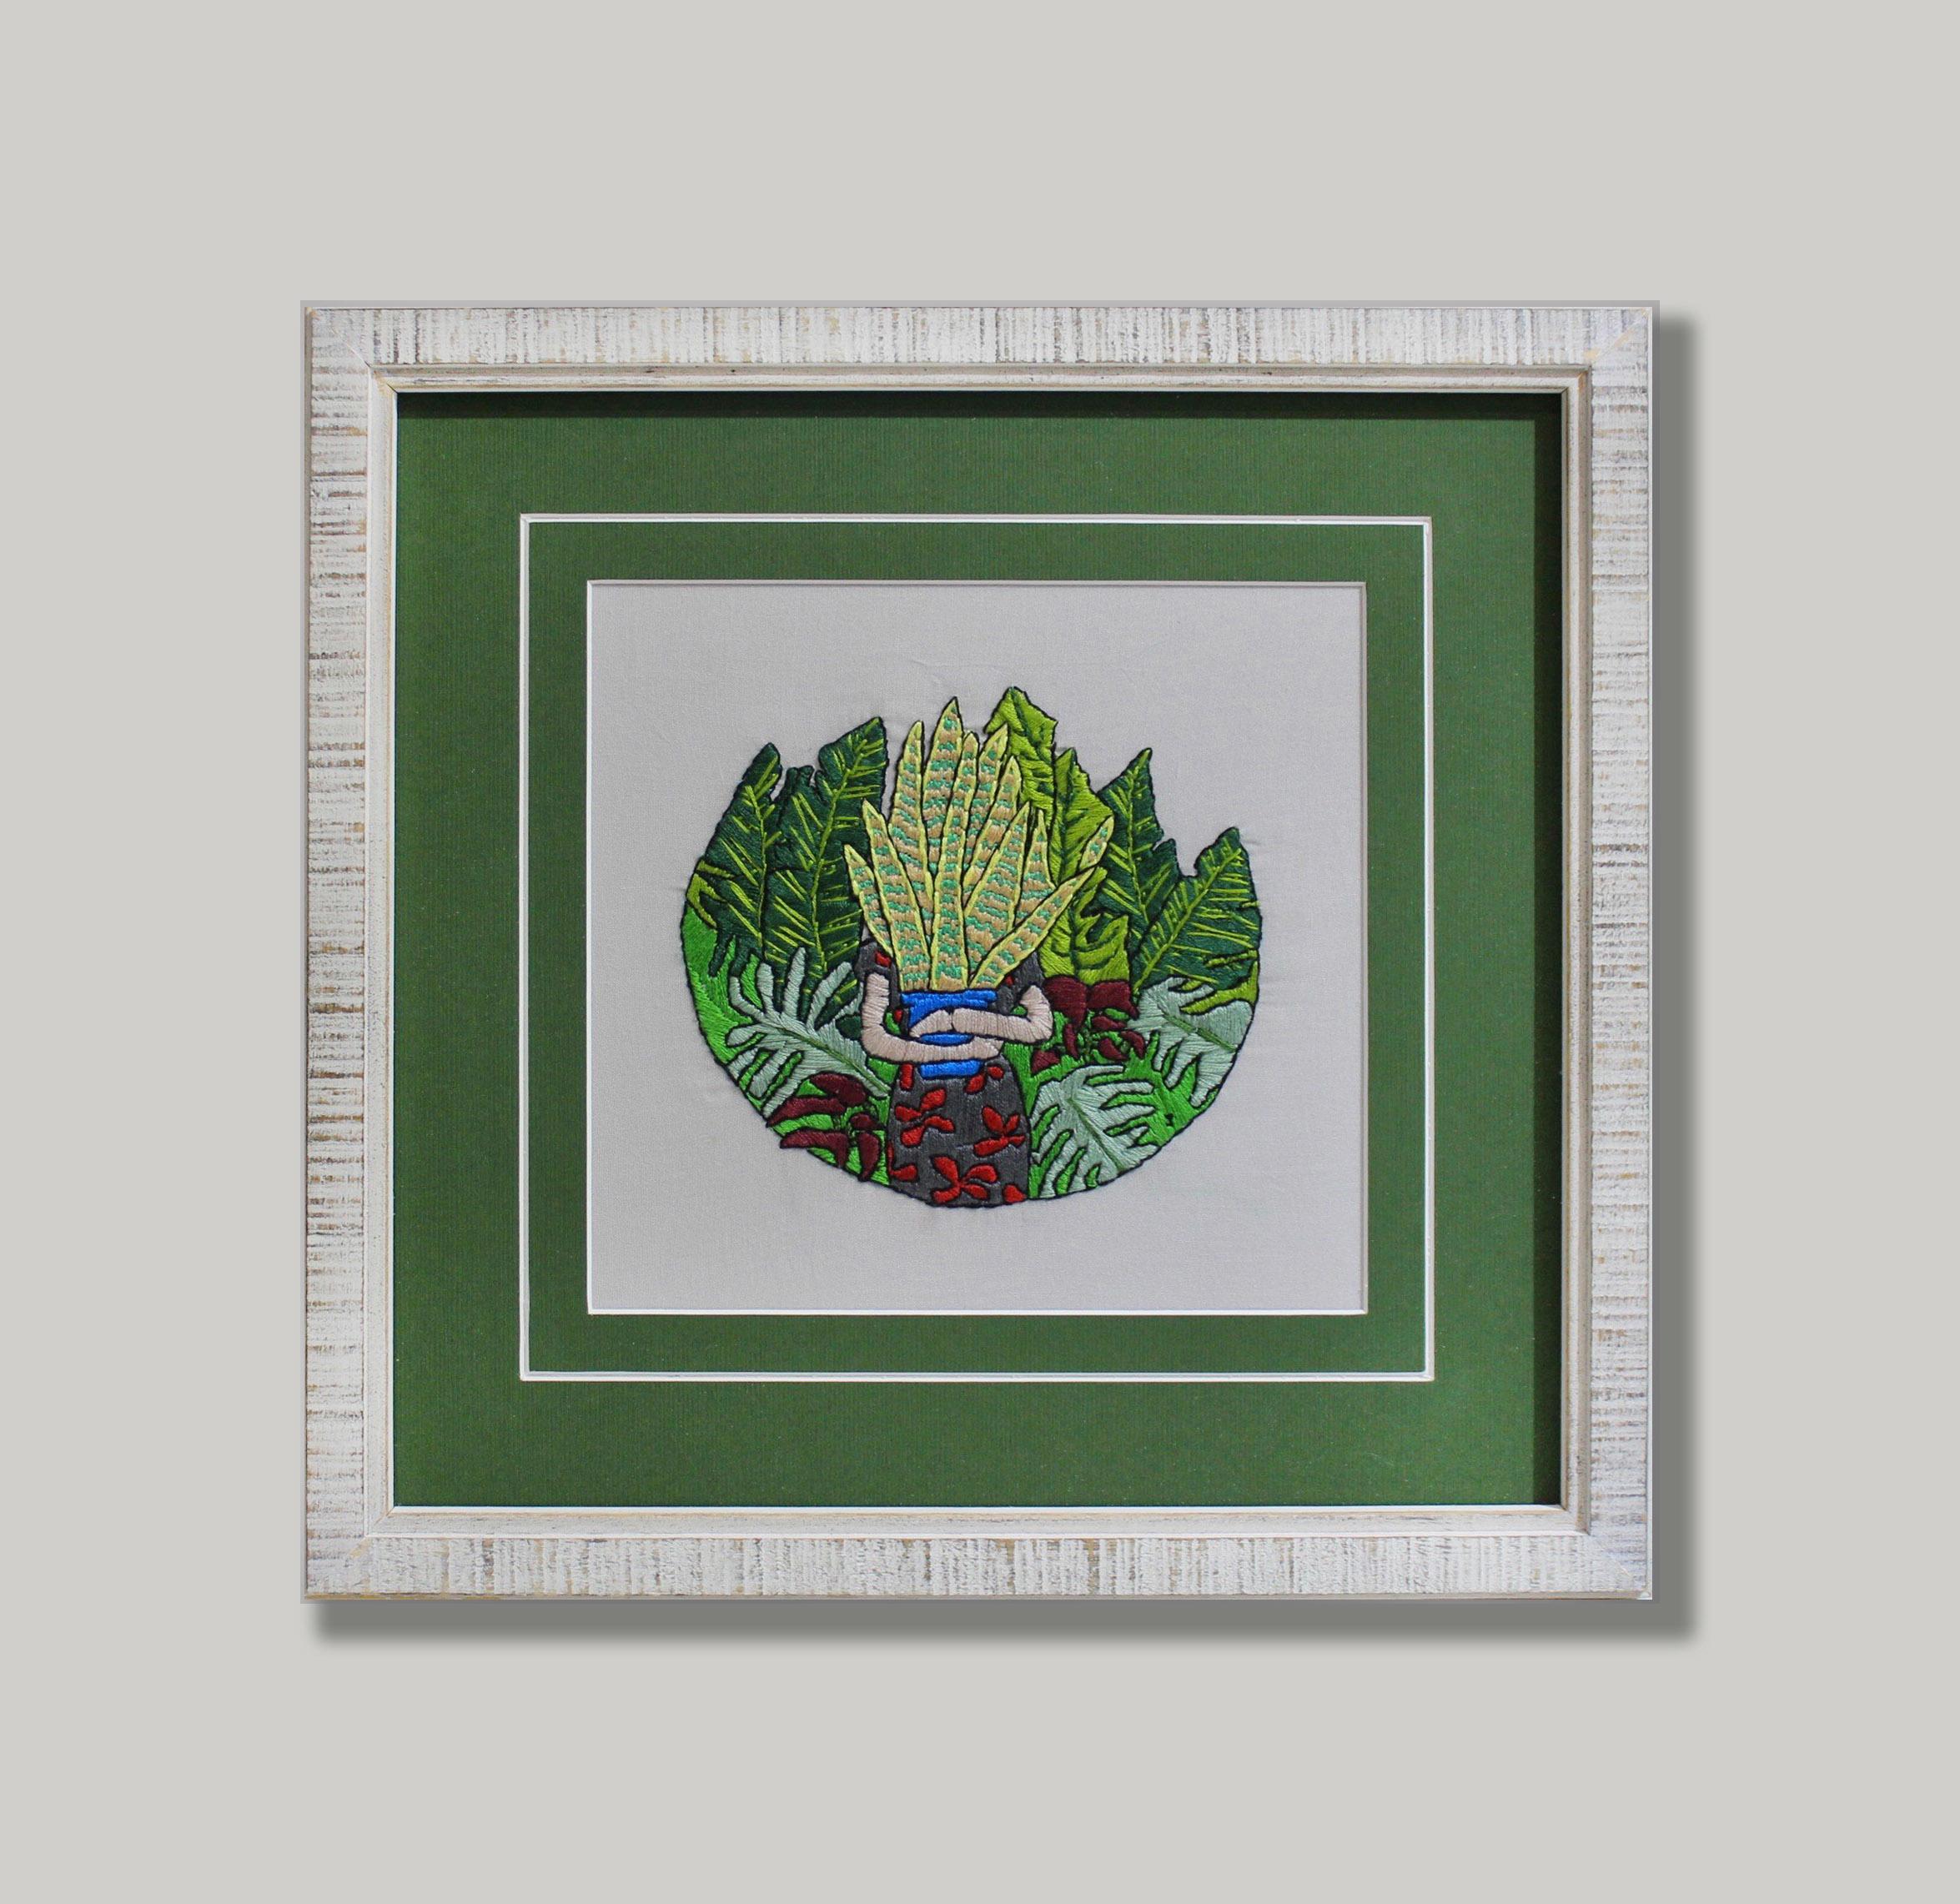 Plant Cross-Stitch Framing Green Matboard Border White Rustic Frame